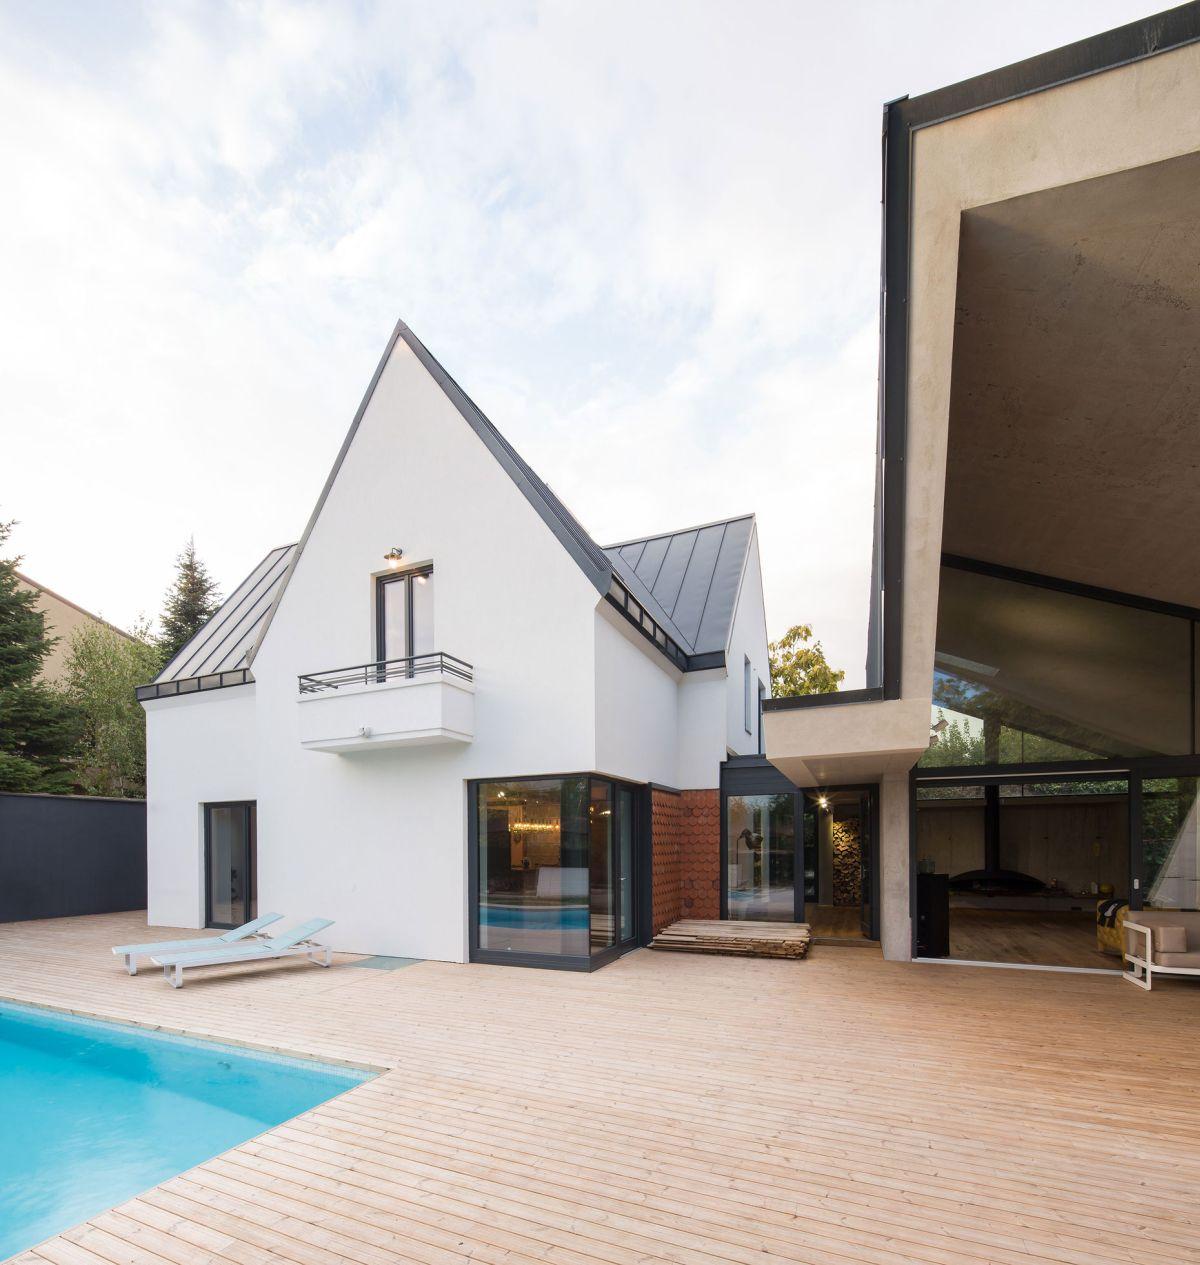 Casa G3 in Otopeni redesigned original house